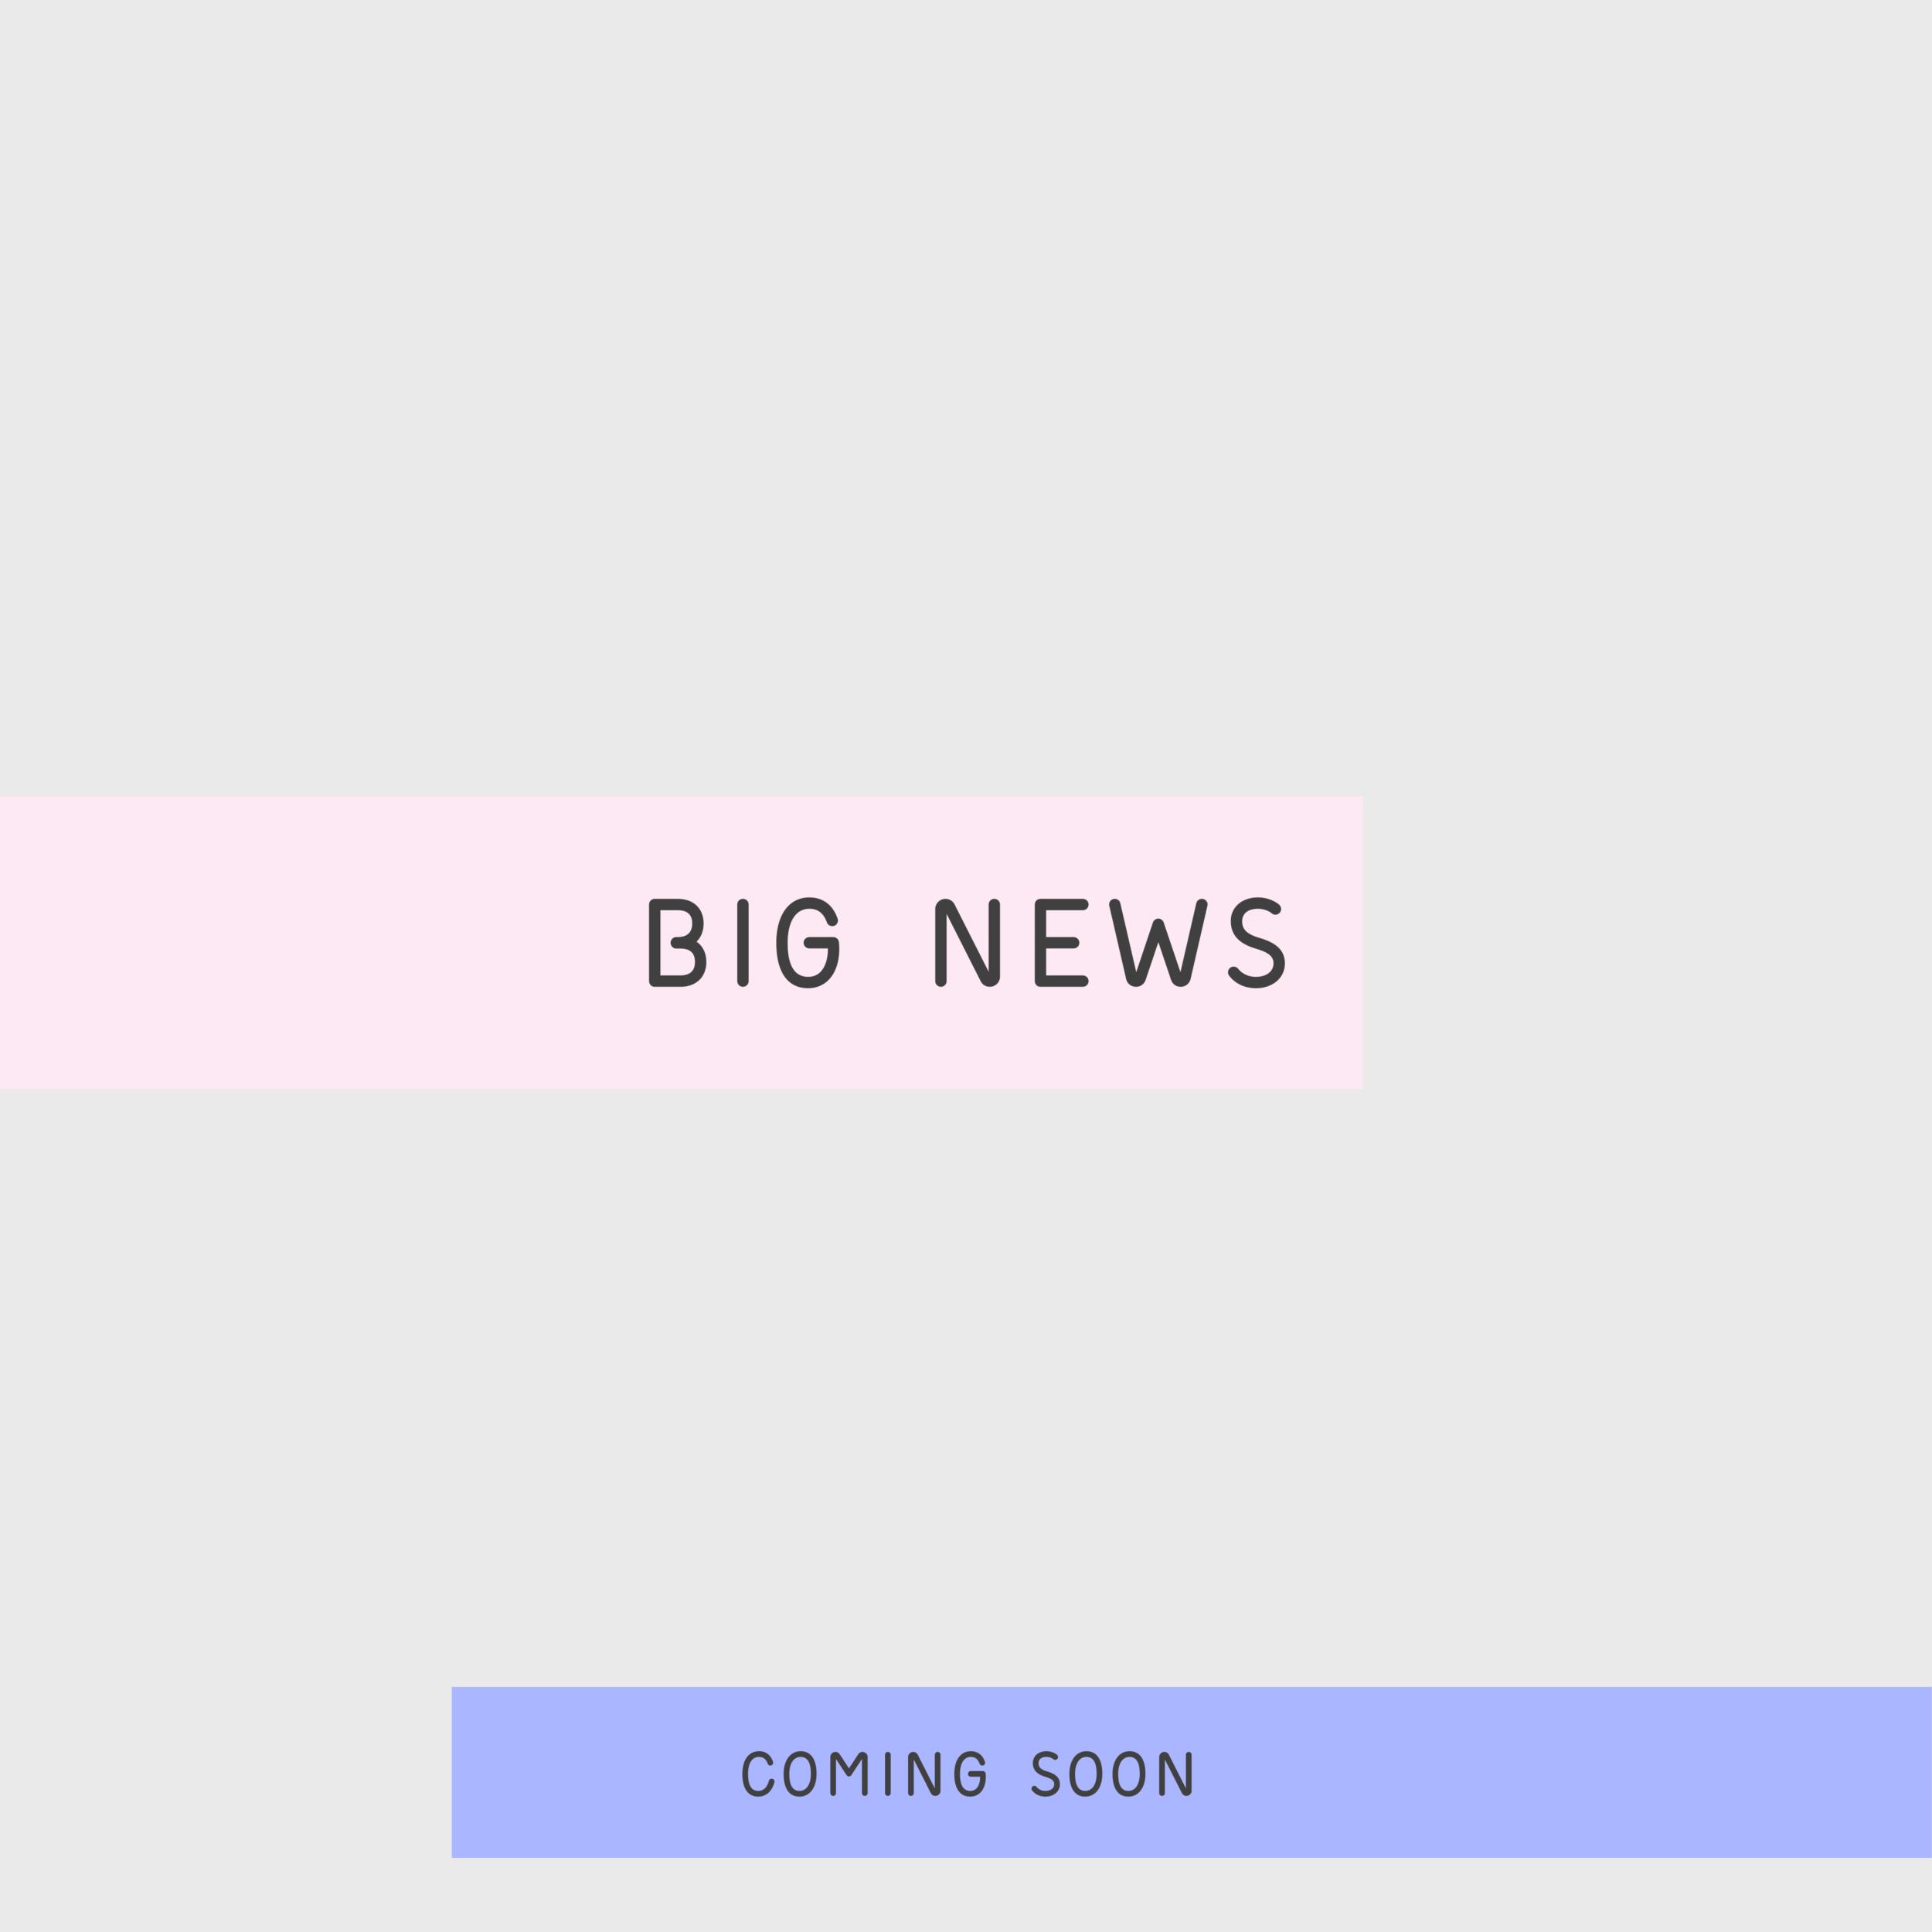 pinkbluegreybignewsblocknewstripes.png